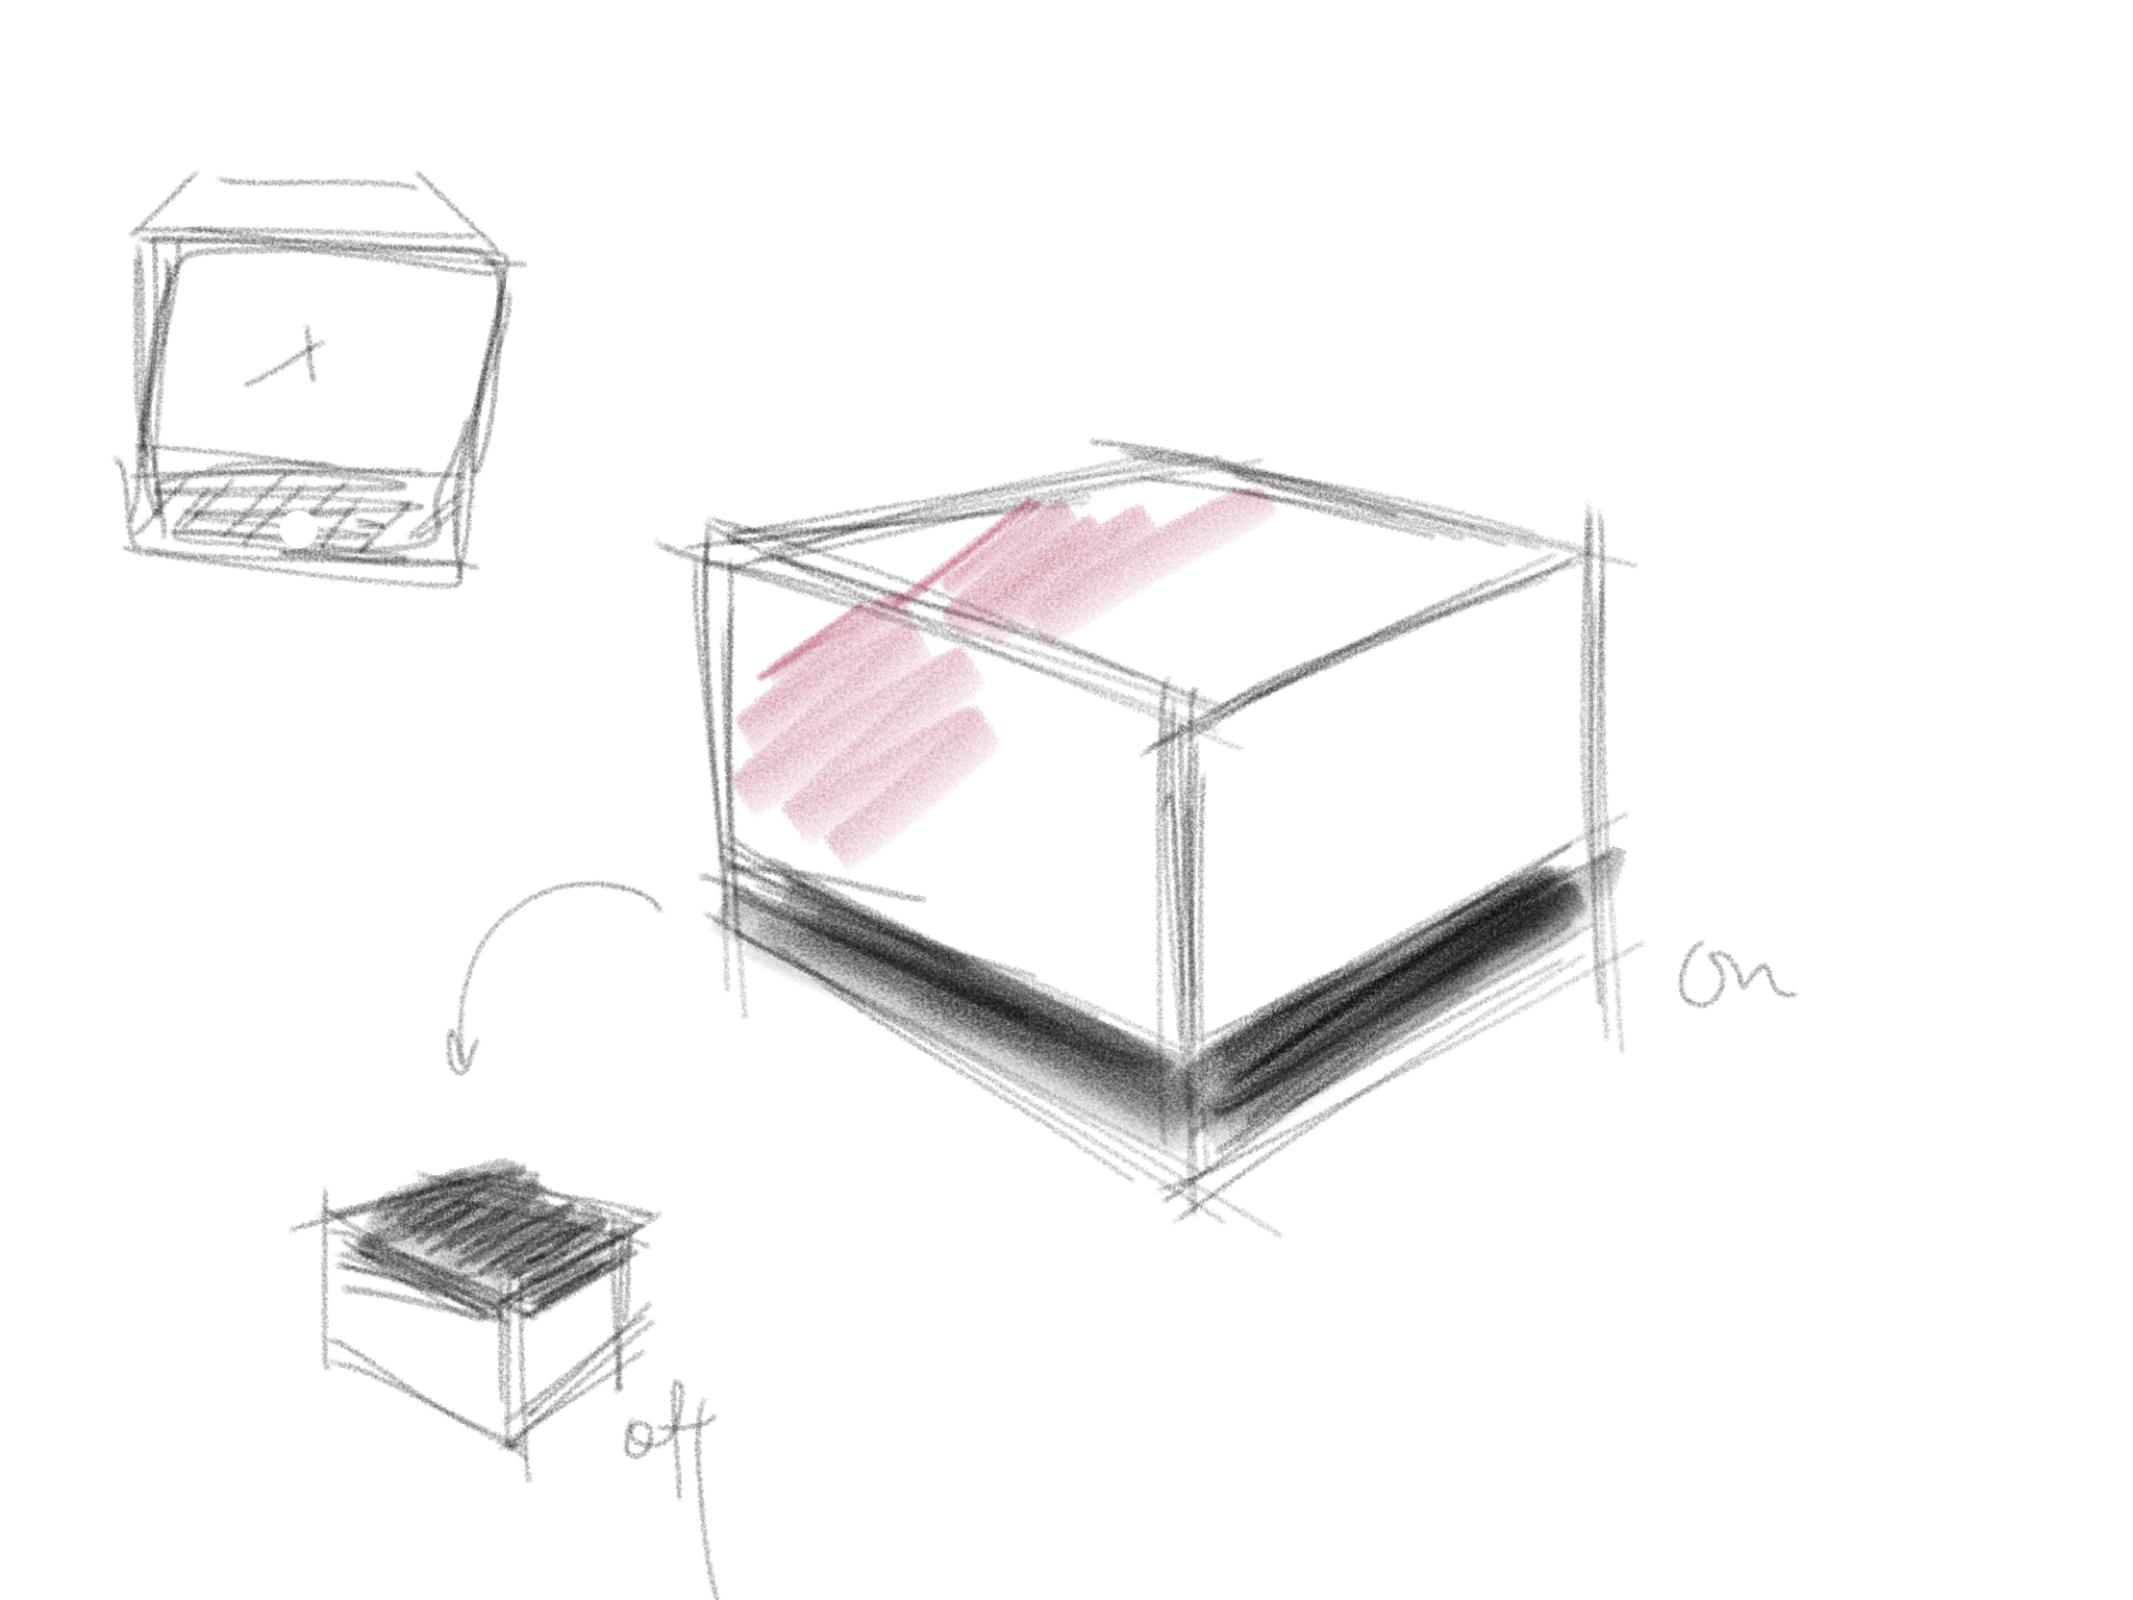 Concept 1: a box